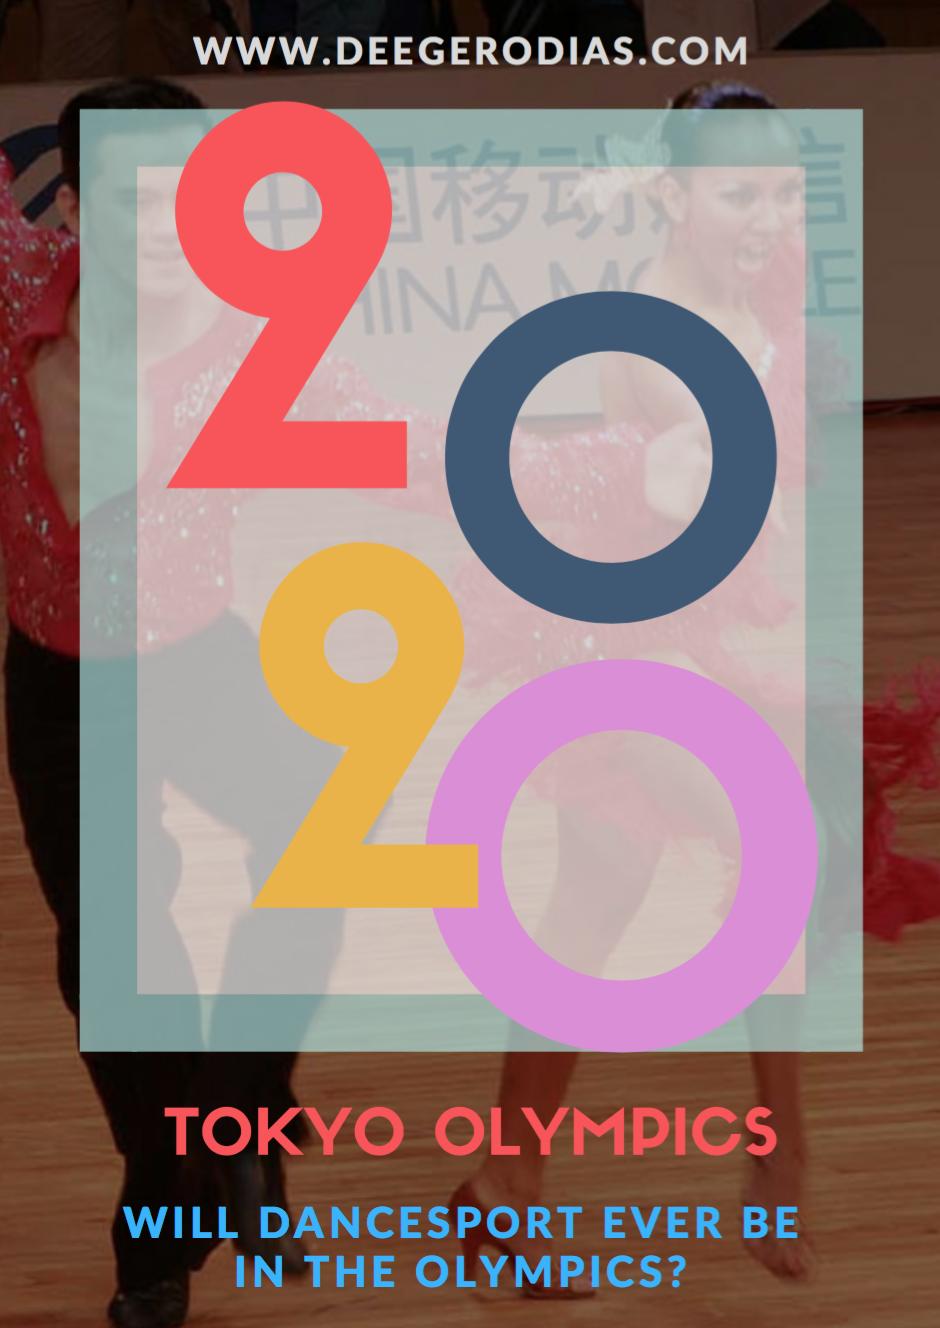 dance-sport-ballroom-latin-olympic-tokyo